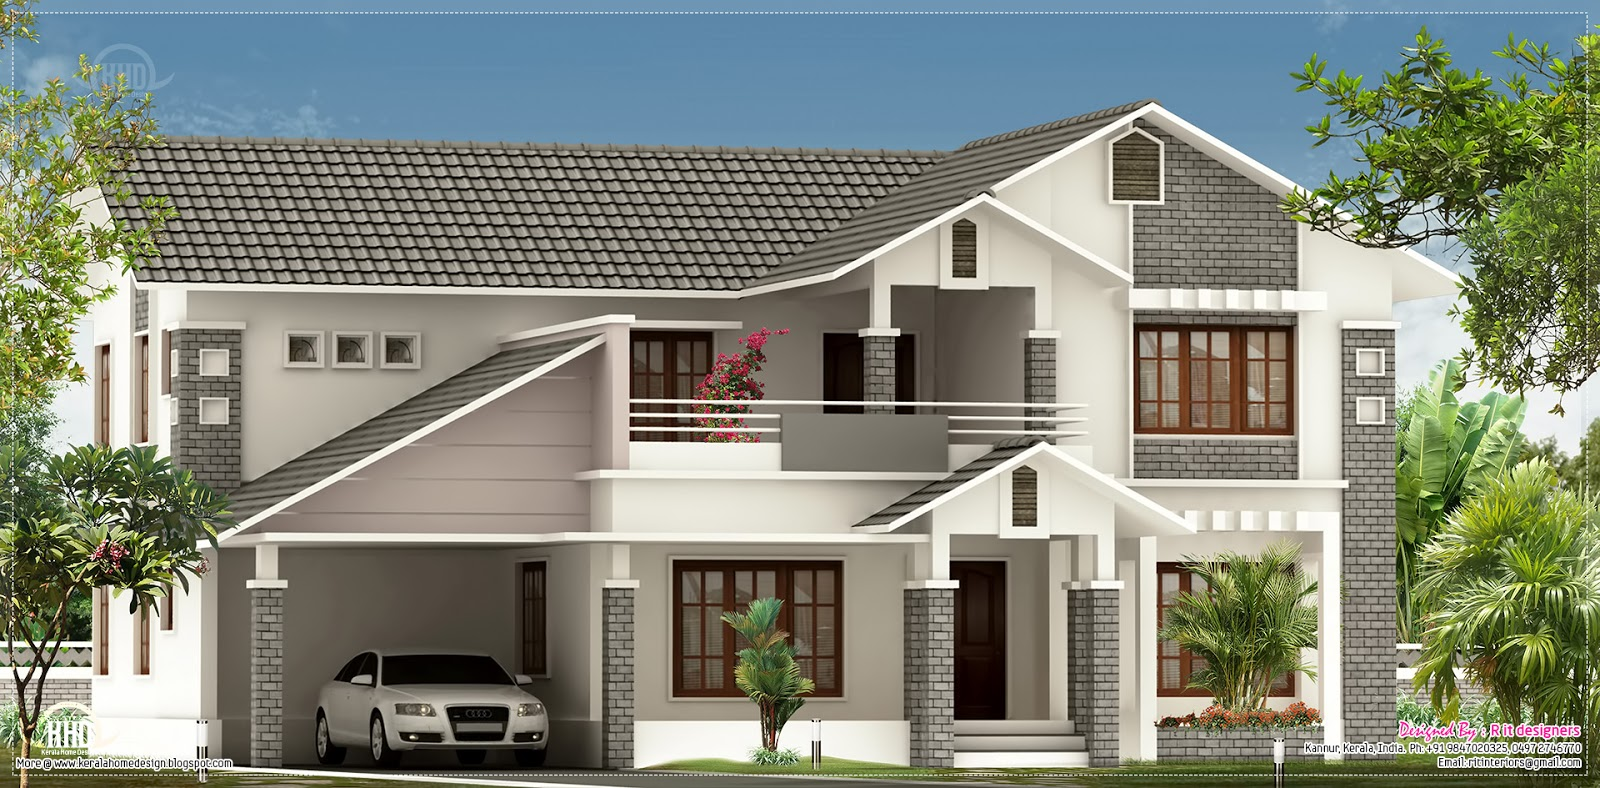 2900 Sq Ft Villa Elevation. House Details